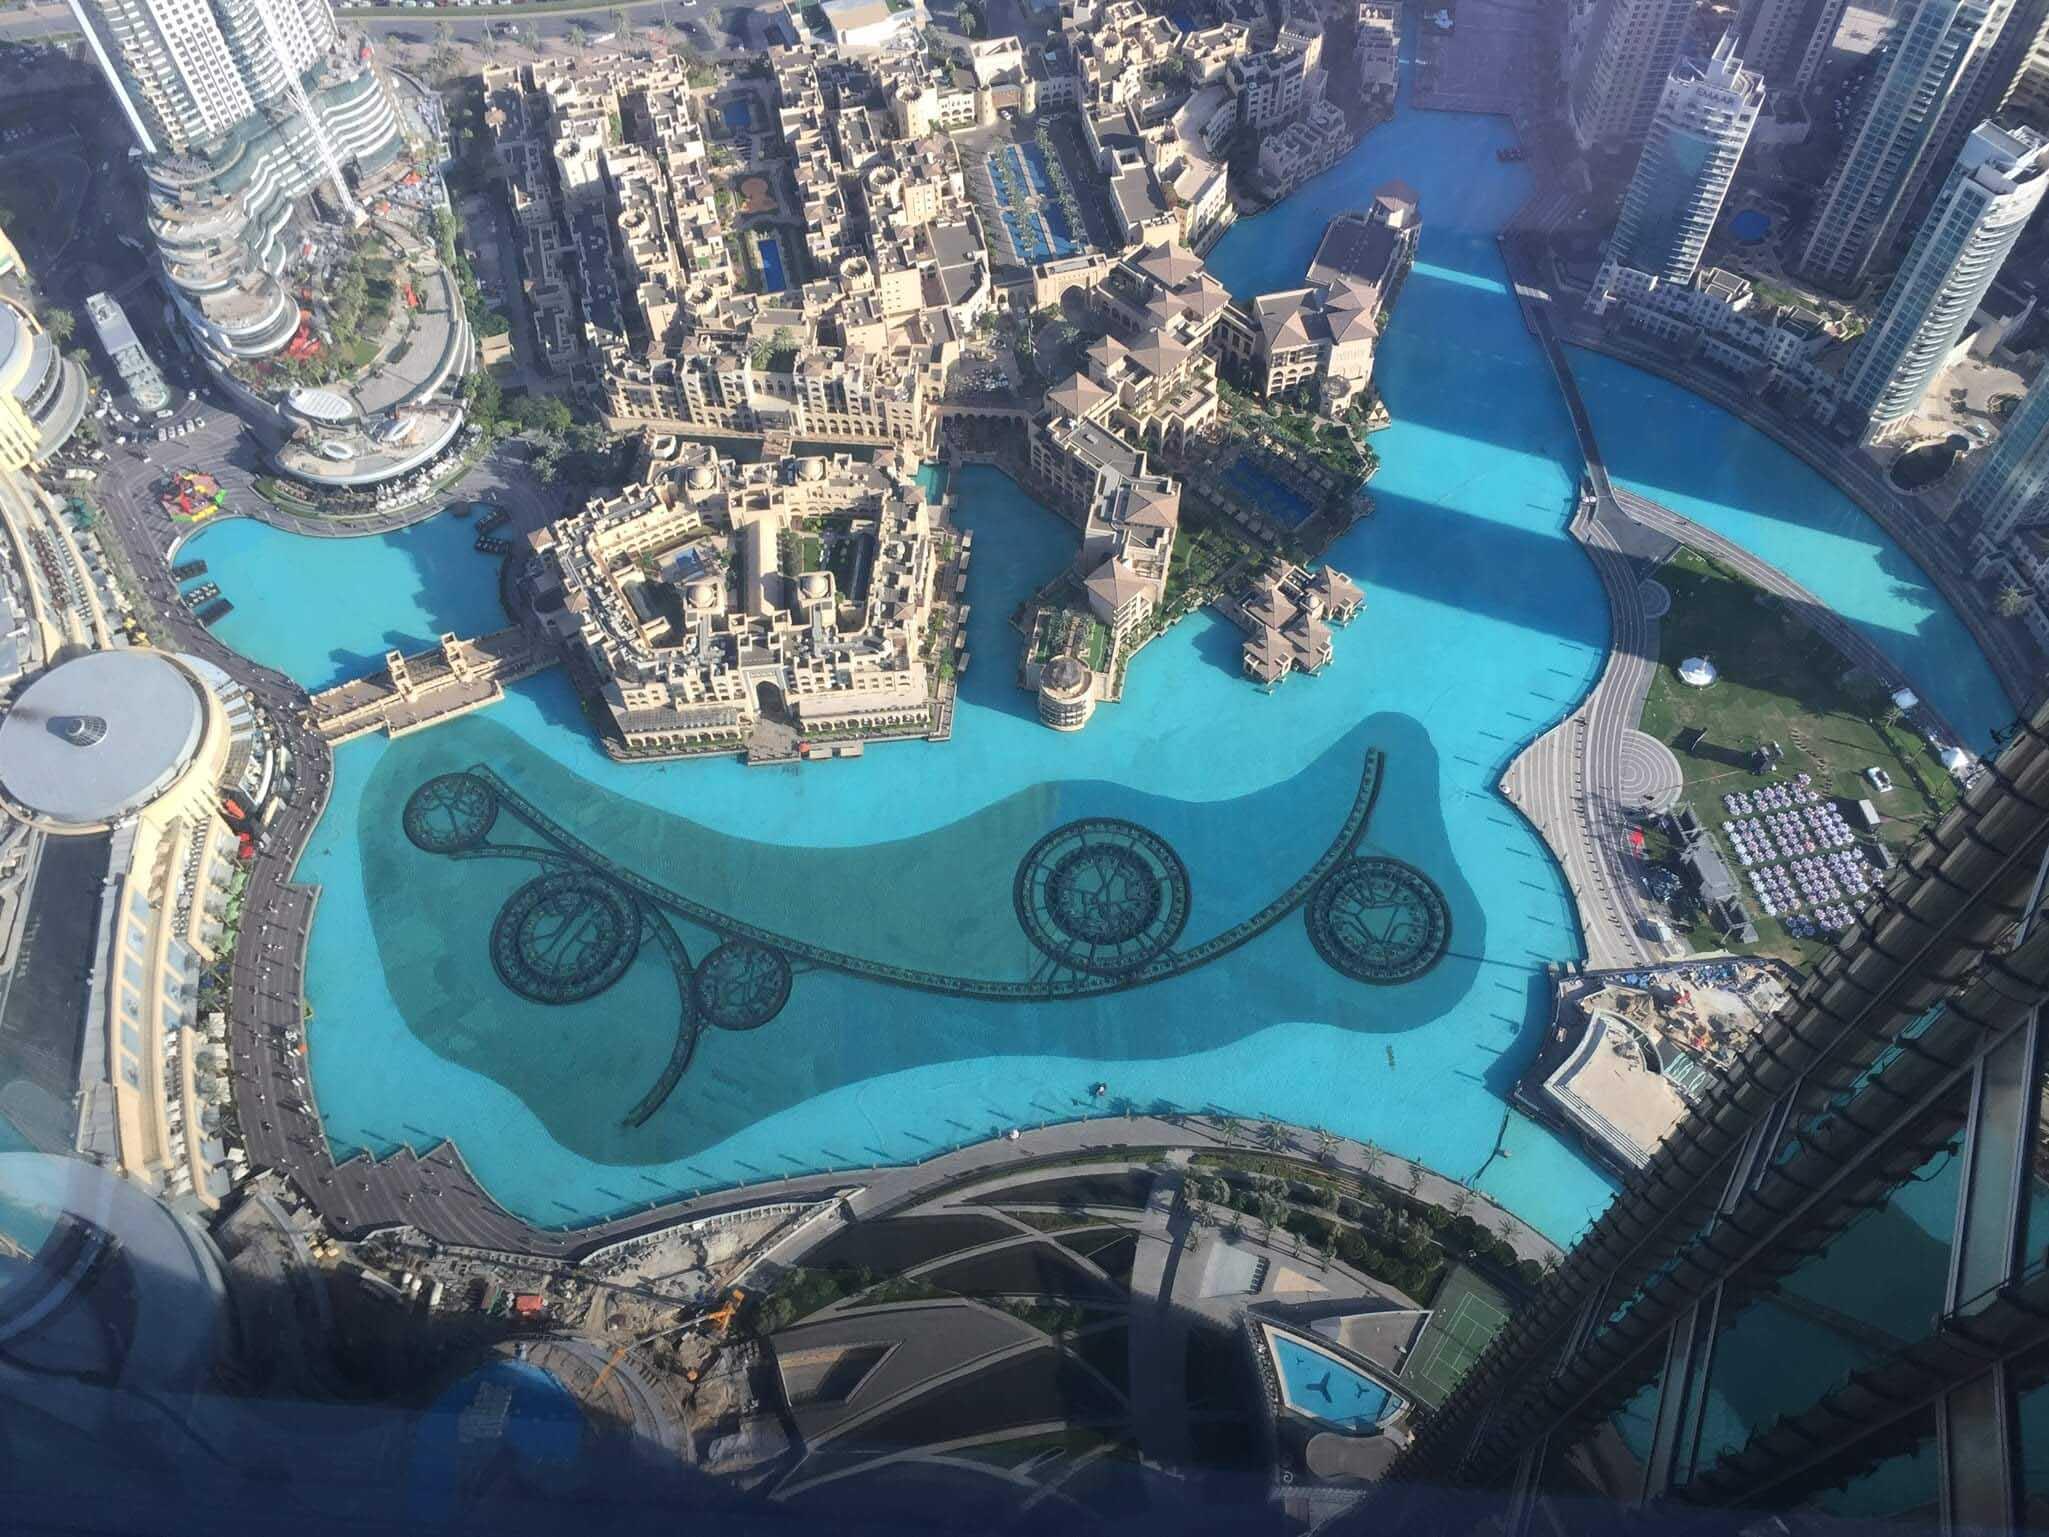 aerial view looking downward on buildings and water in Dubai